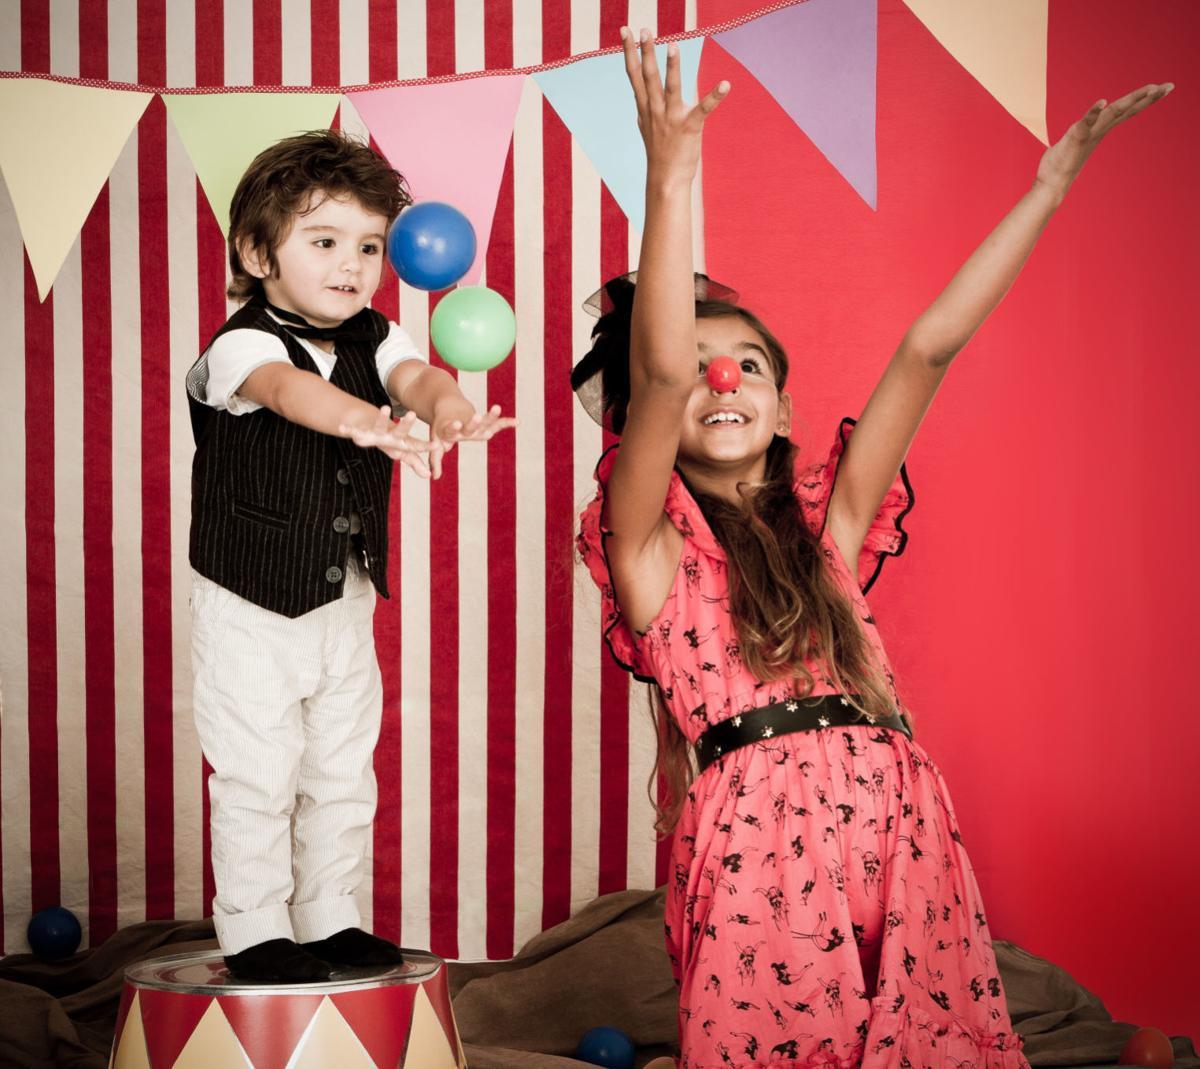 Cute circus performance